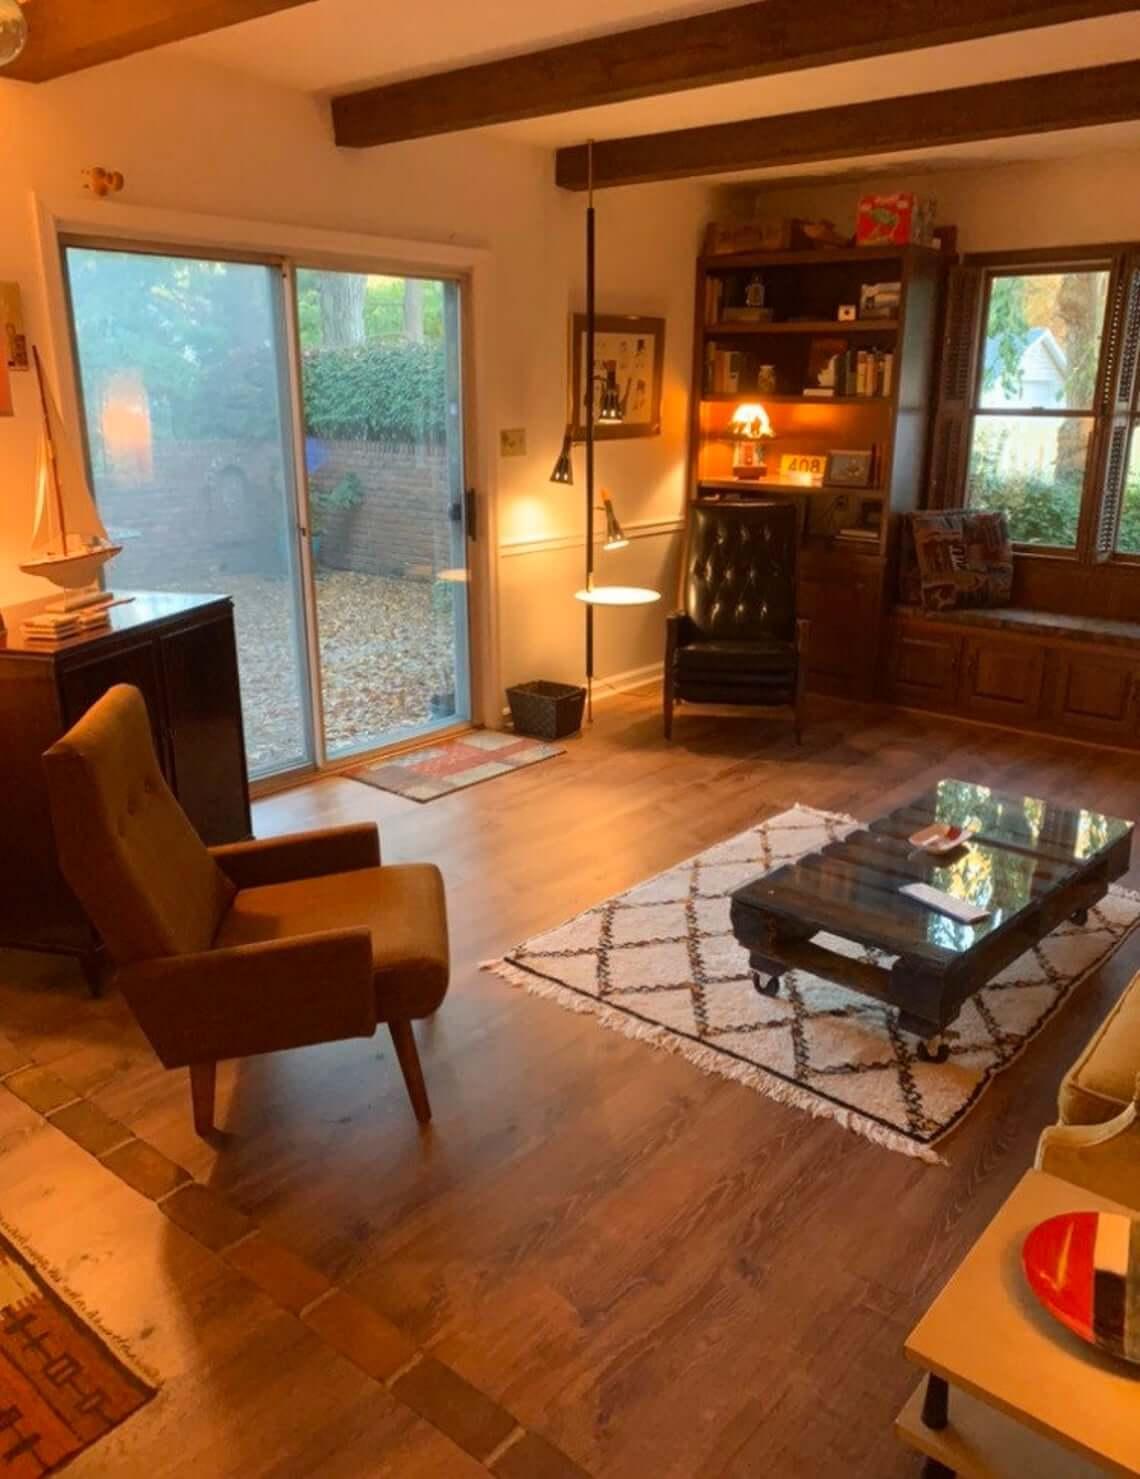 21 Best Vintage Living Room Decor And Design Ideas For 2021